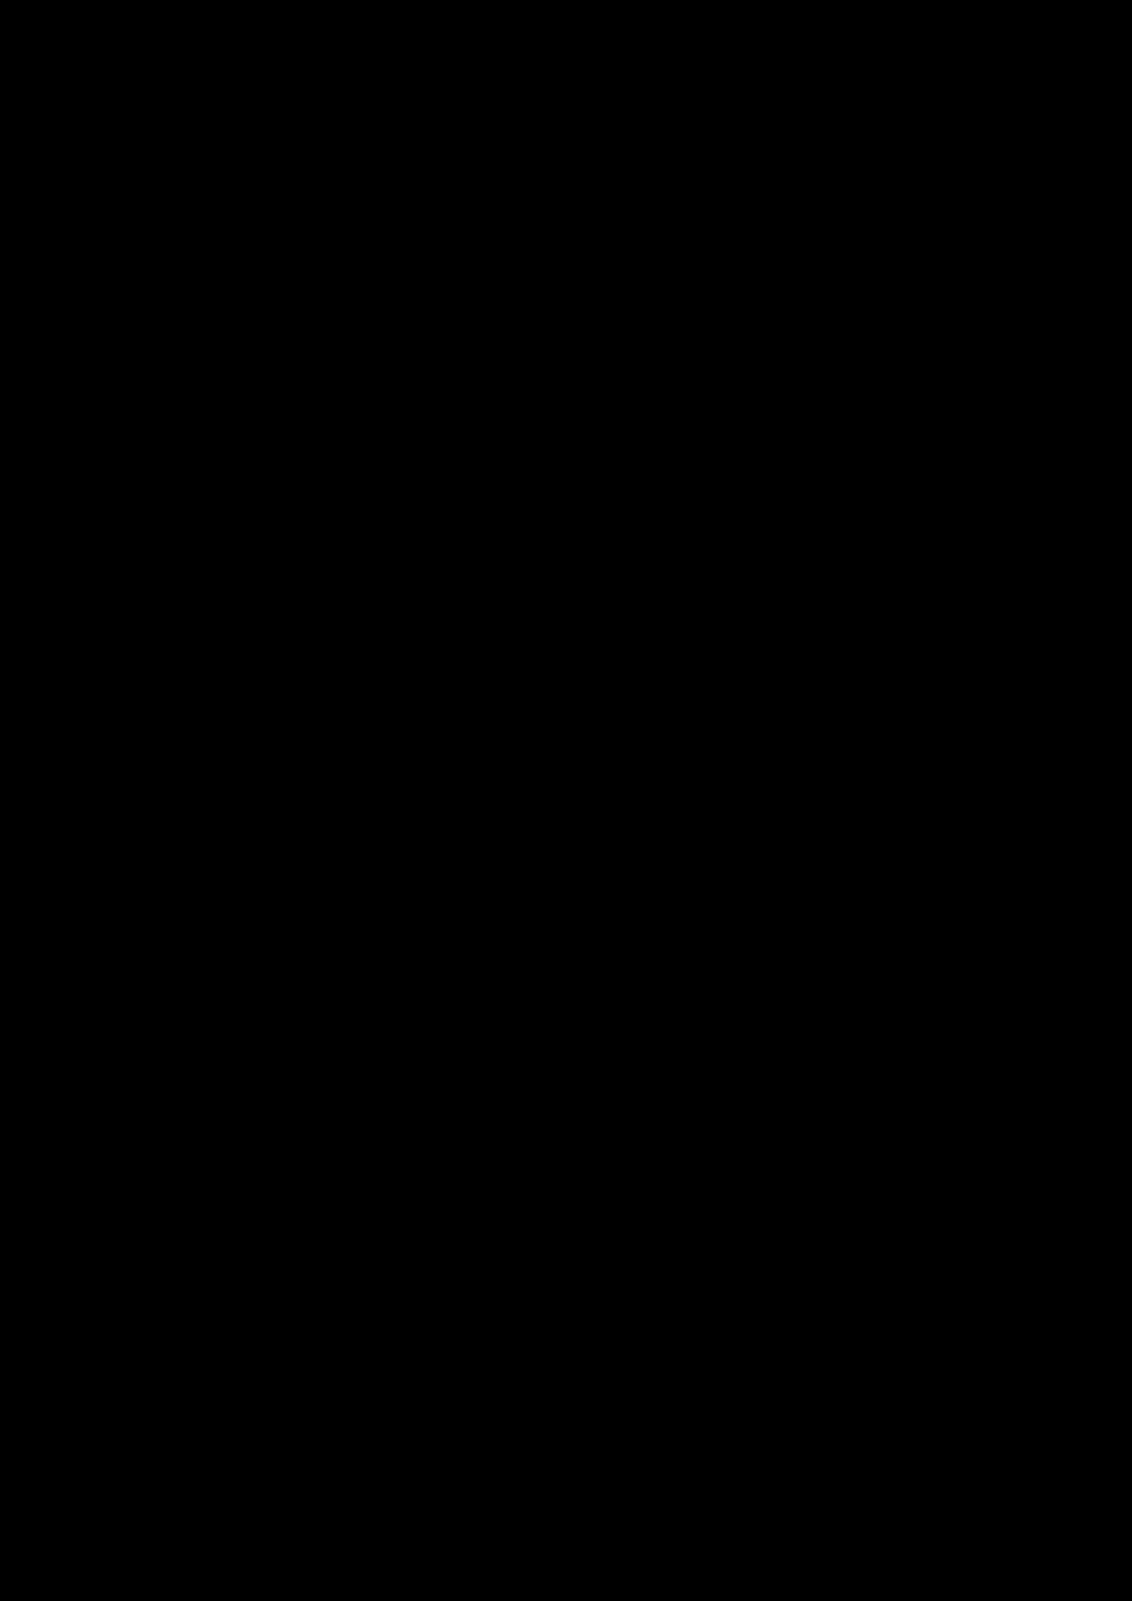 Korolevstvo slez slide, Image 62